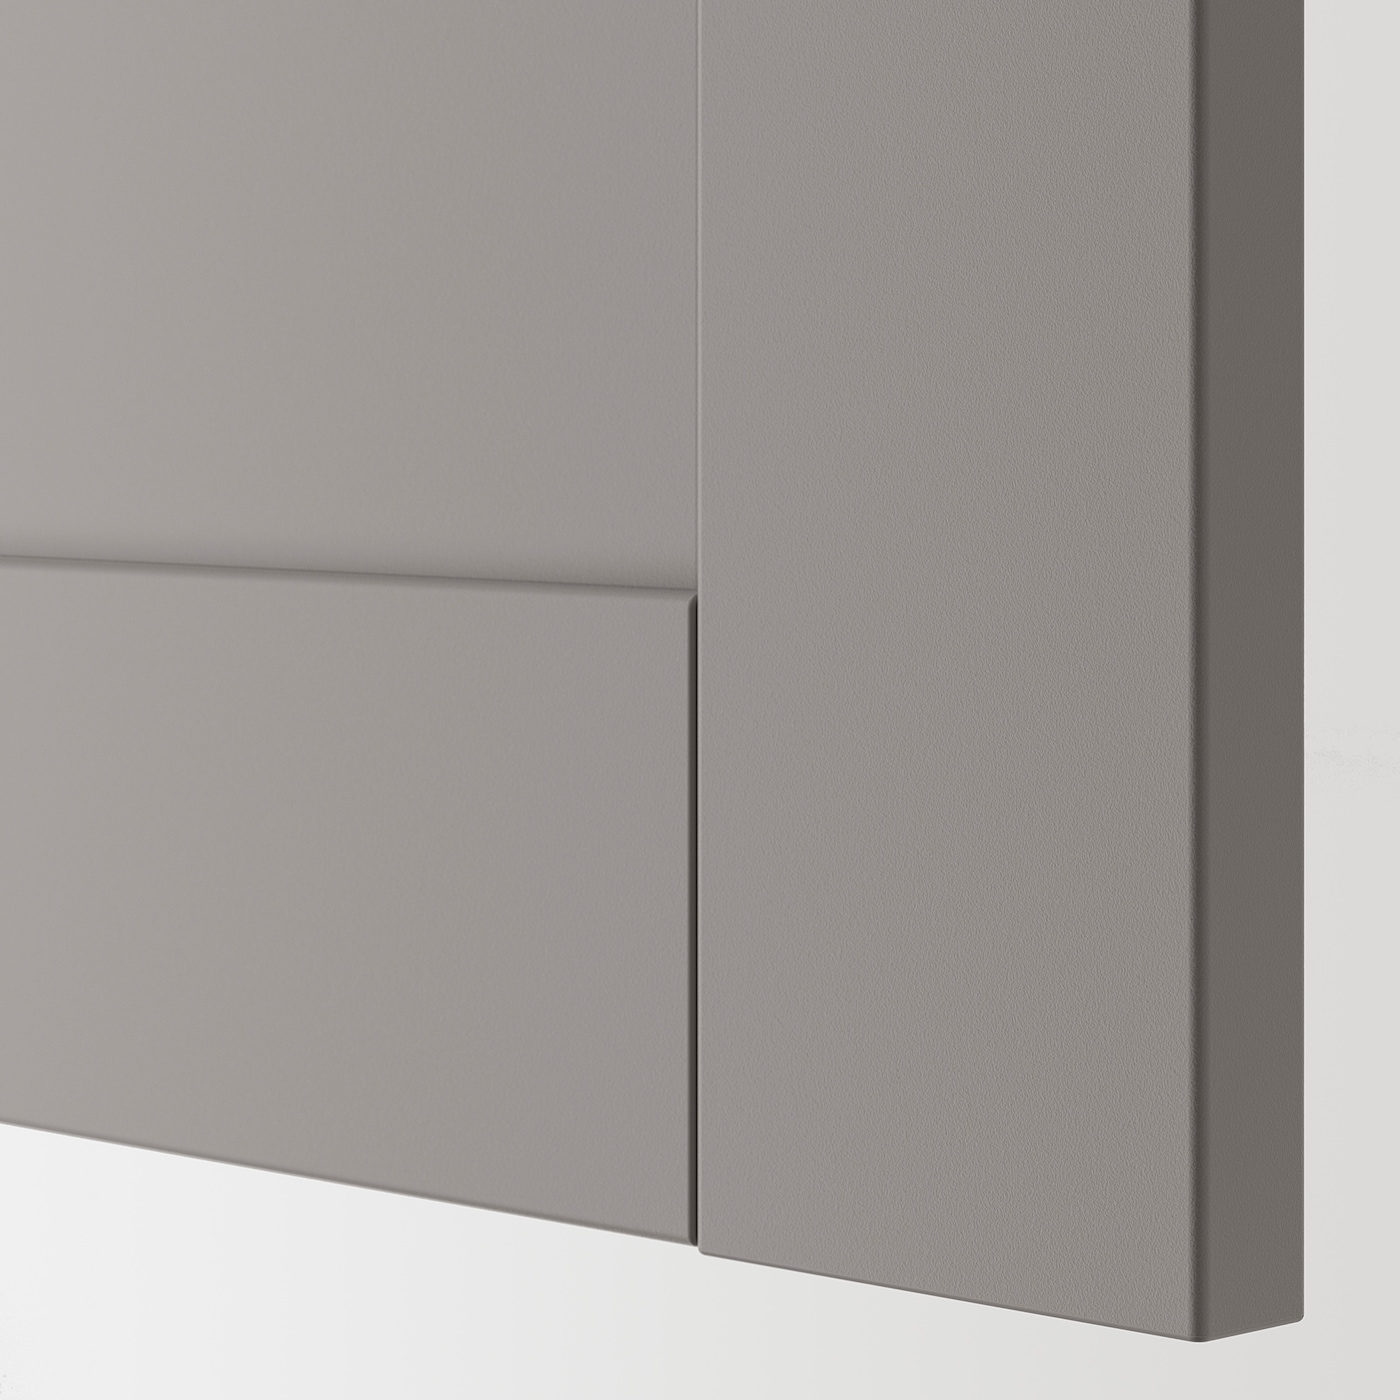 ENHET خزانة قاعدة مع رف/أبواب, أبيض/رمادي هيكل, 80x62x75 سم